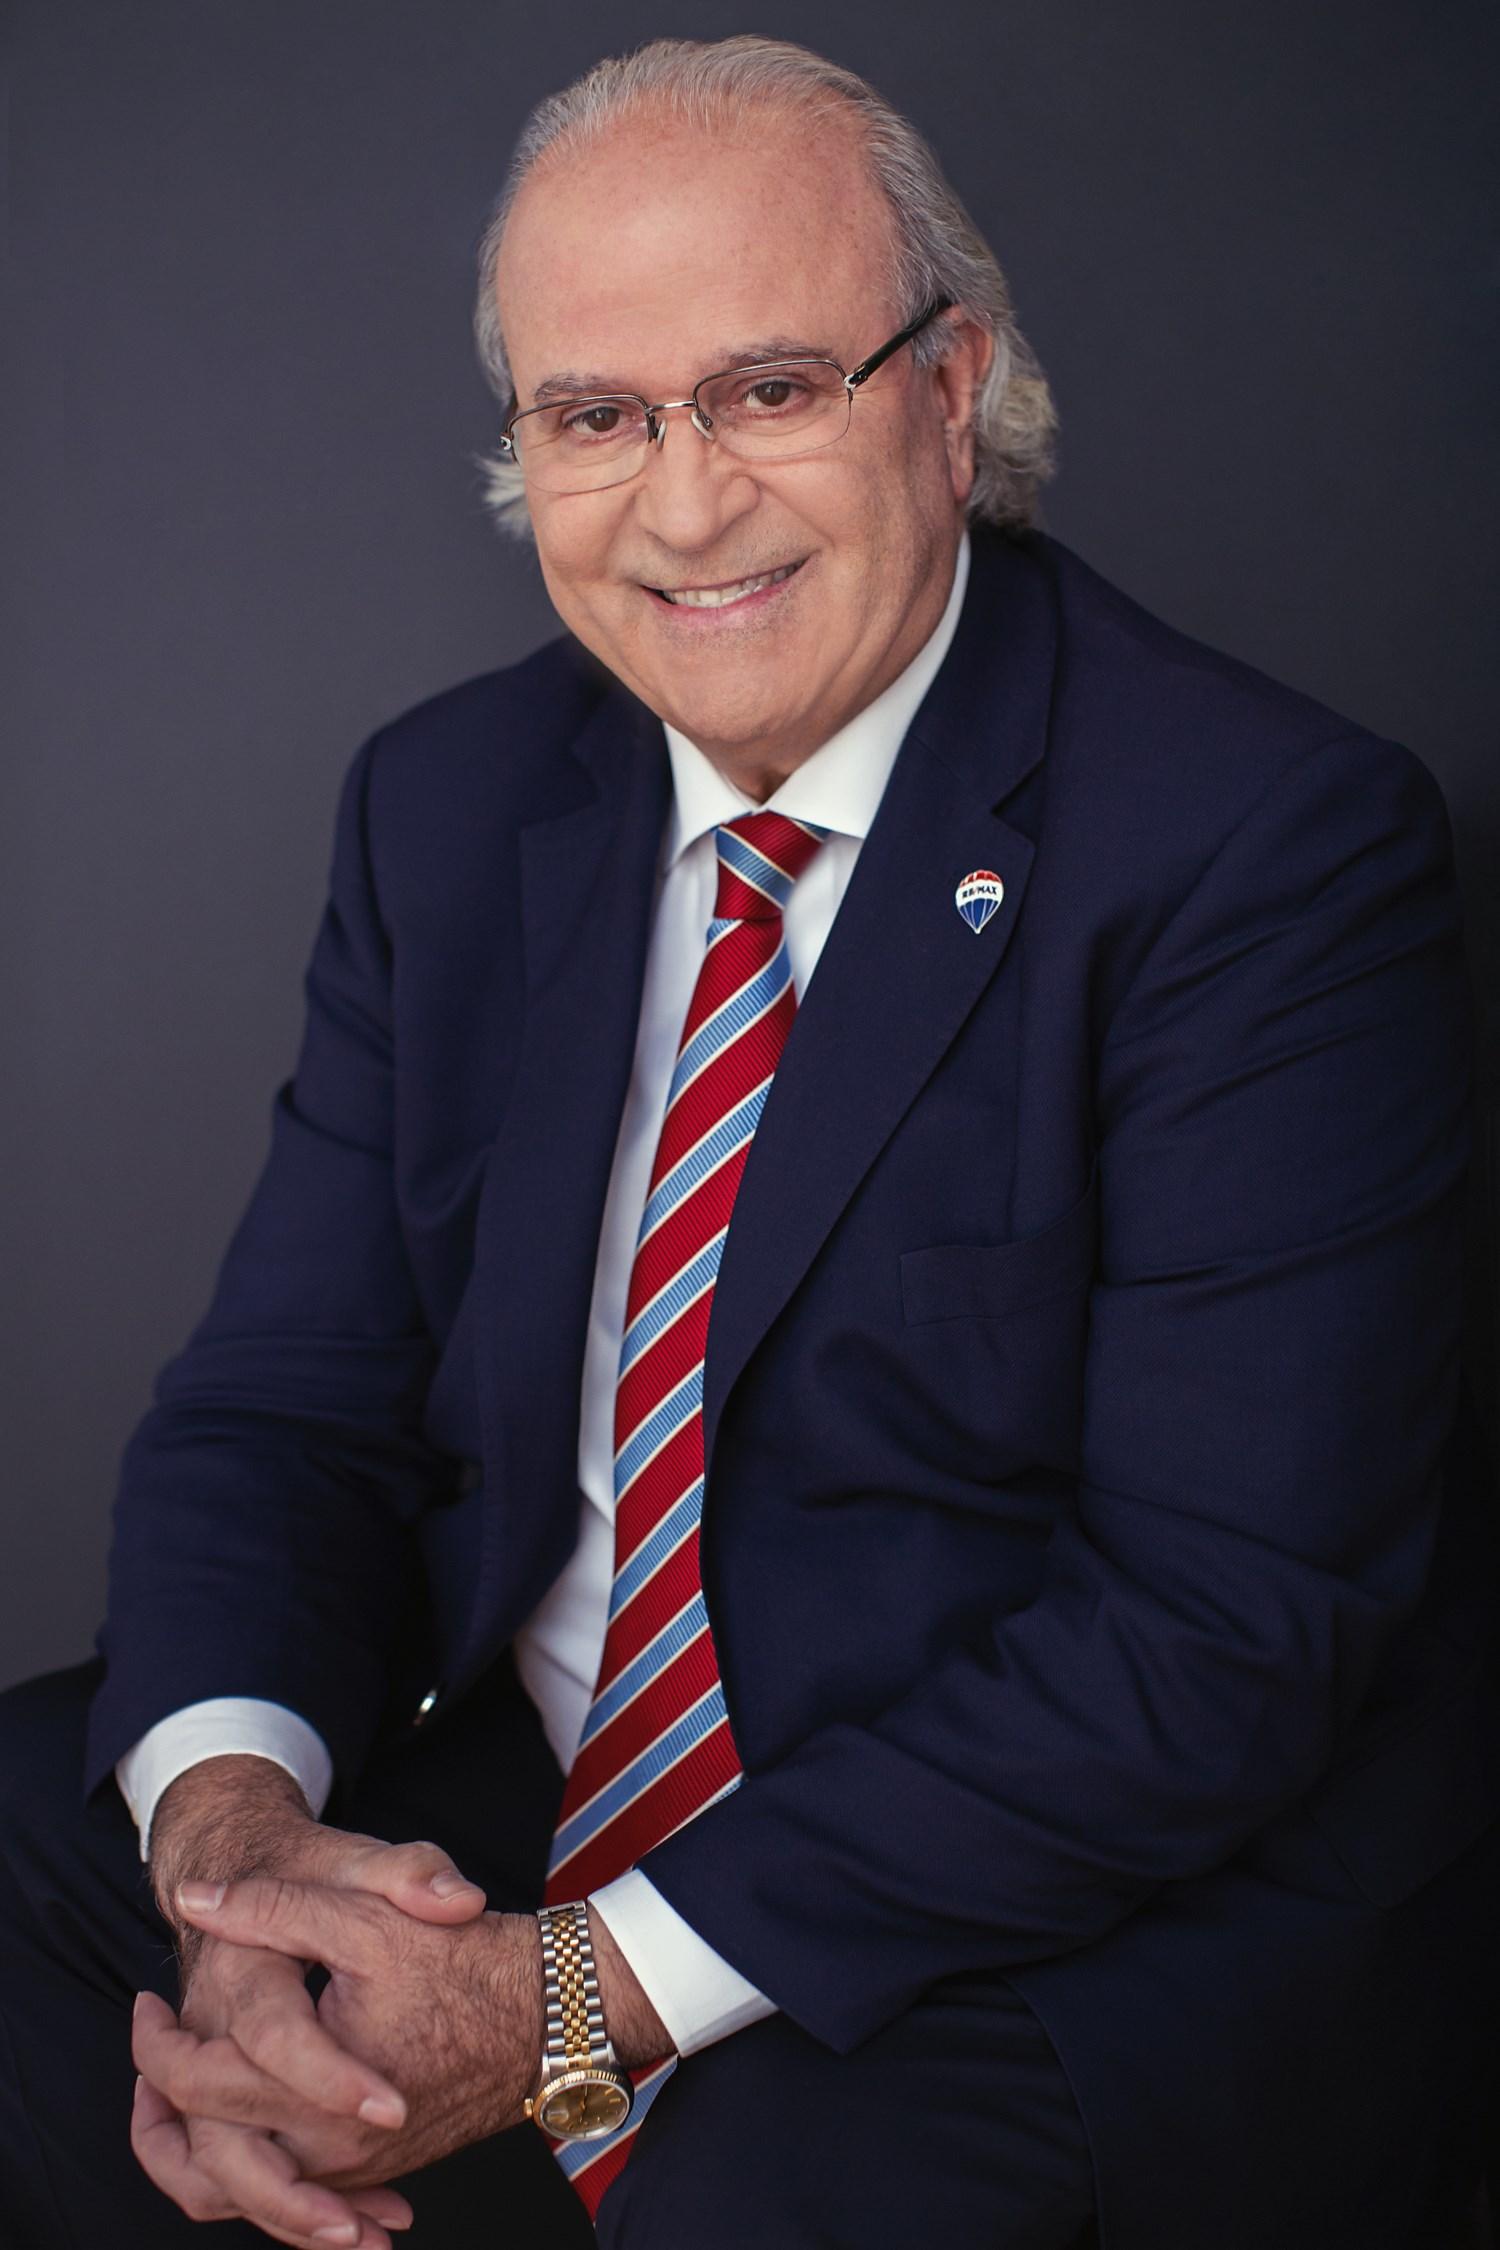 Ramón García Parra